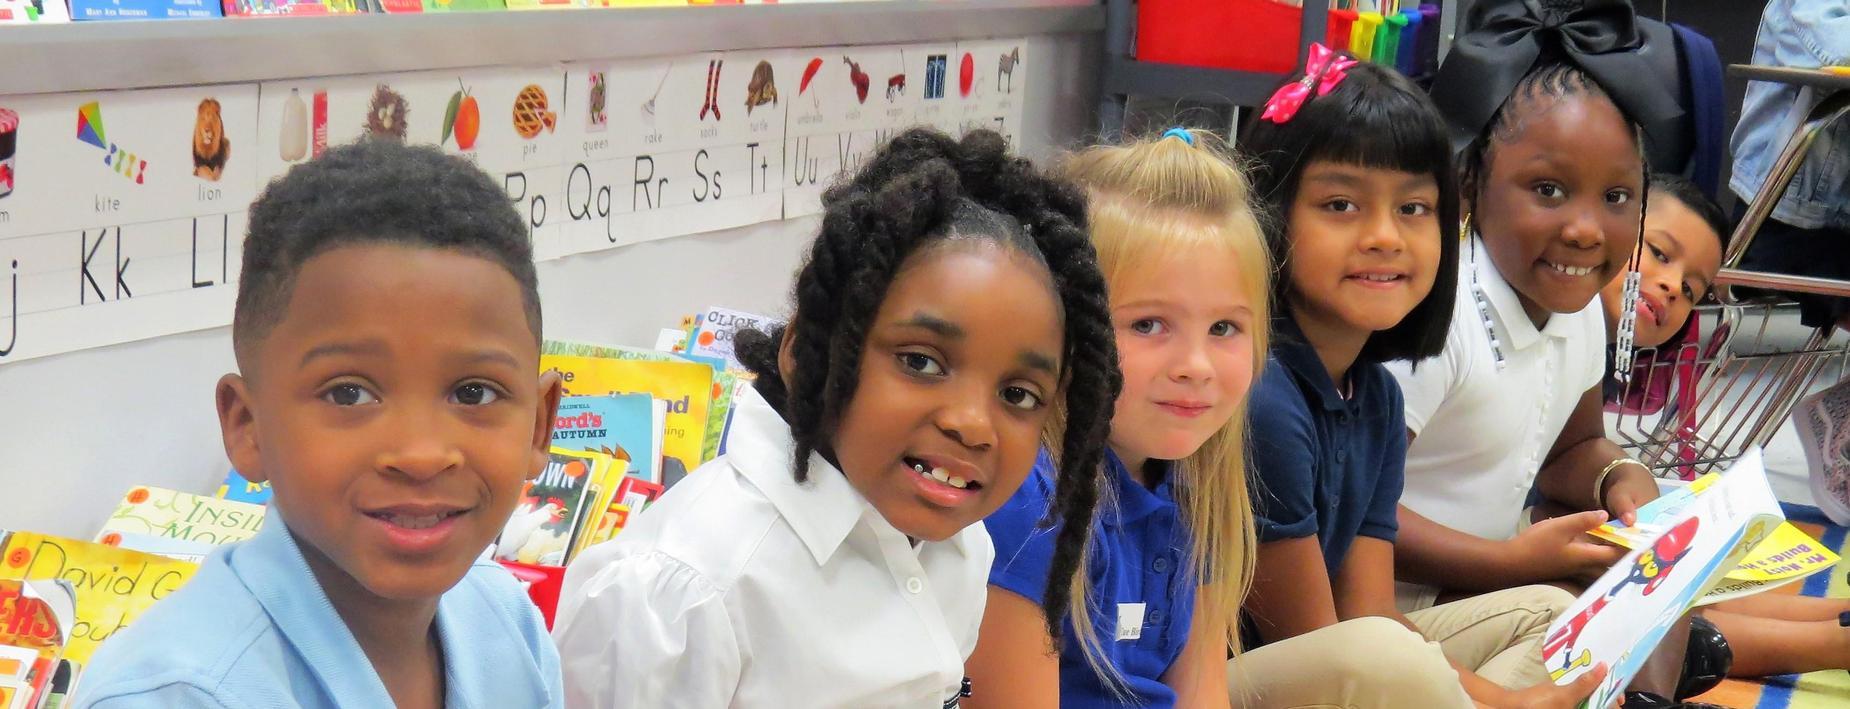 Ready for a GREAT year at Ridgeland Elementary School!